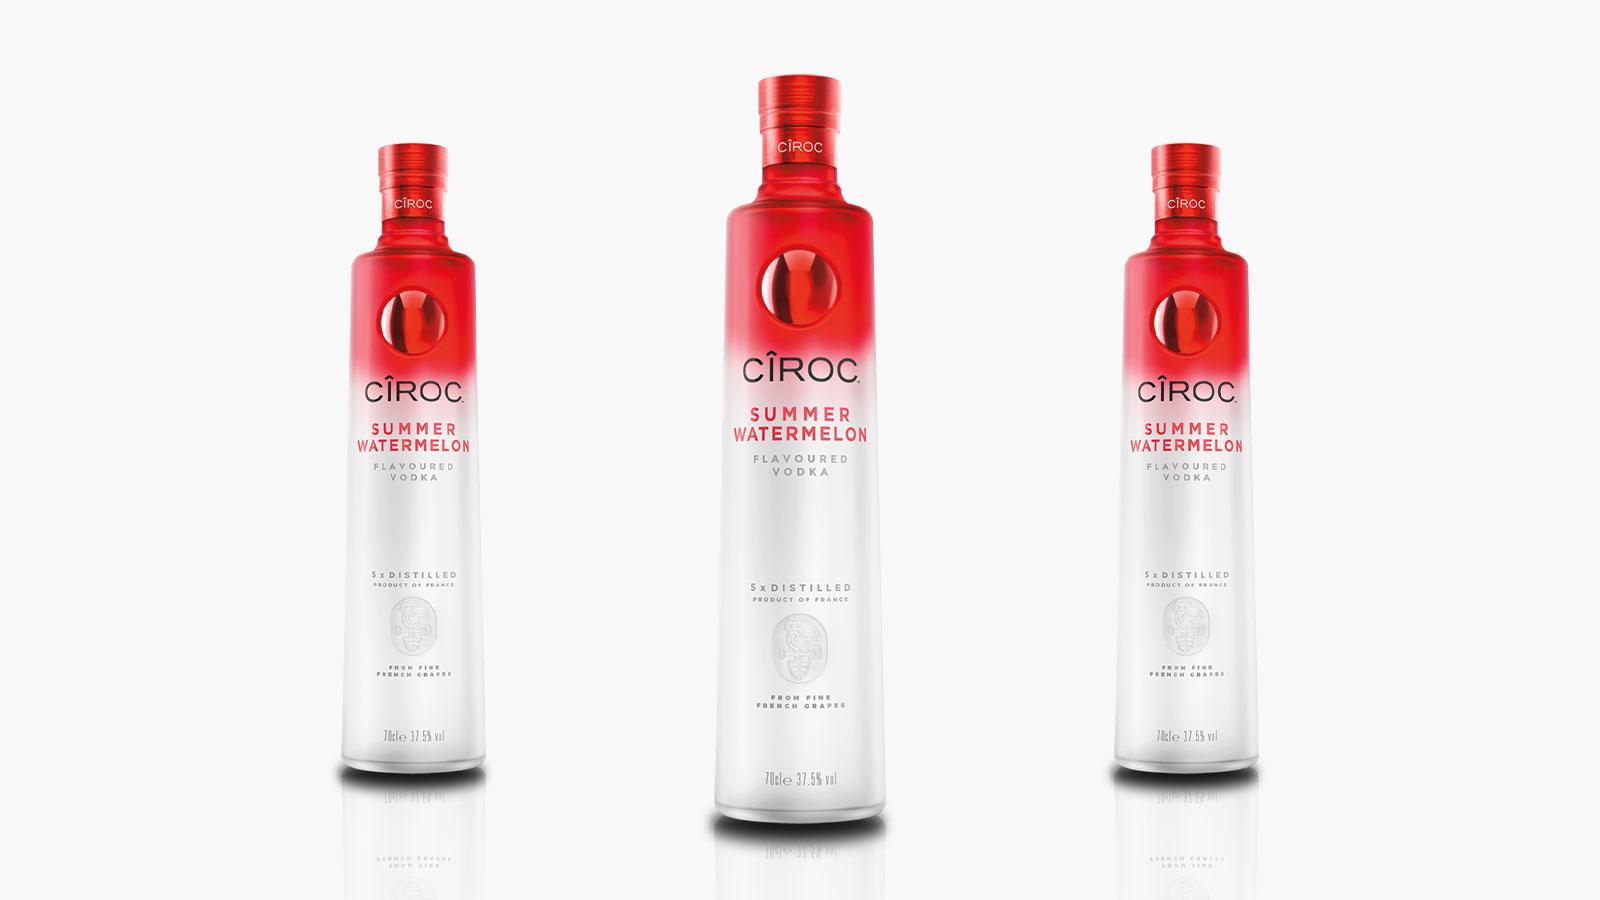 CÎROC Summer Watermelon Vodka Limited Edition